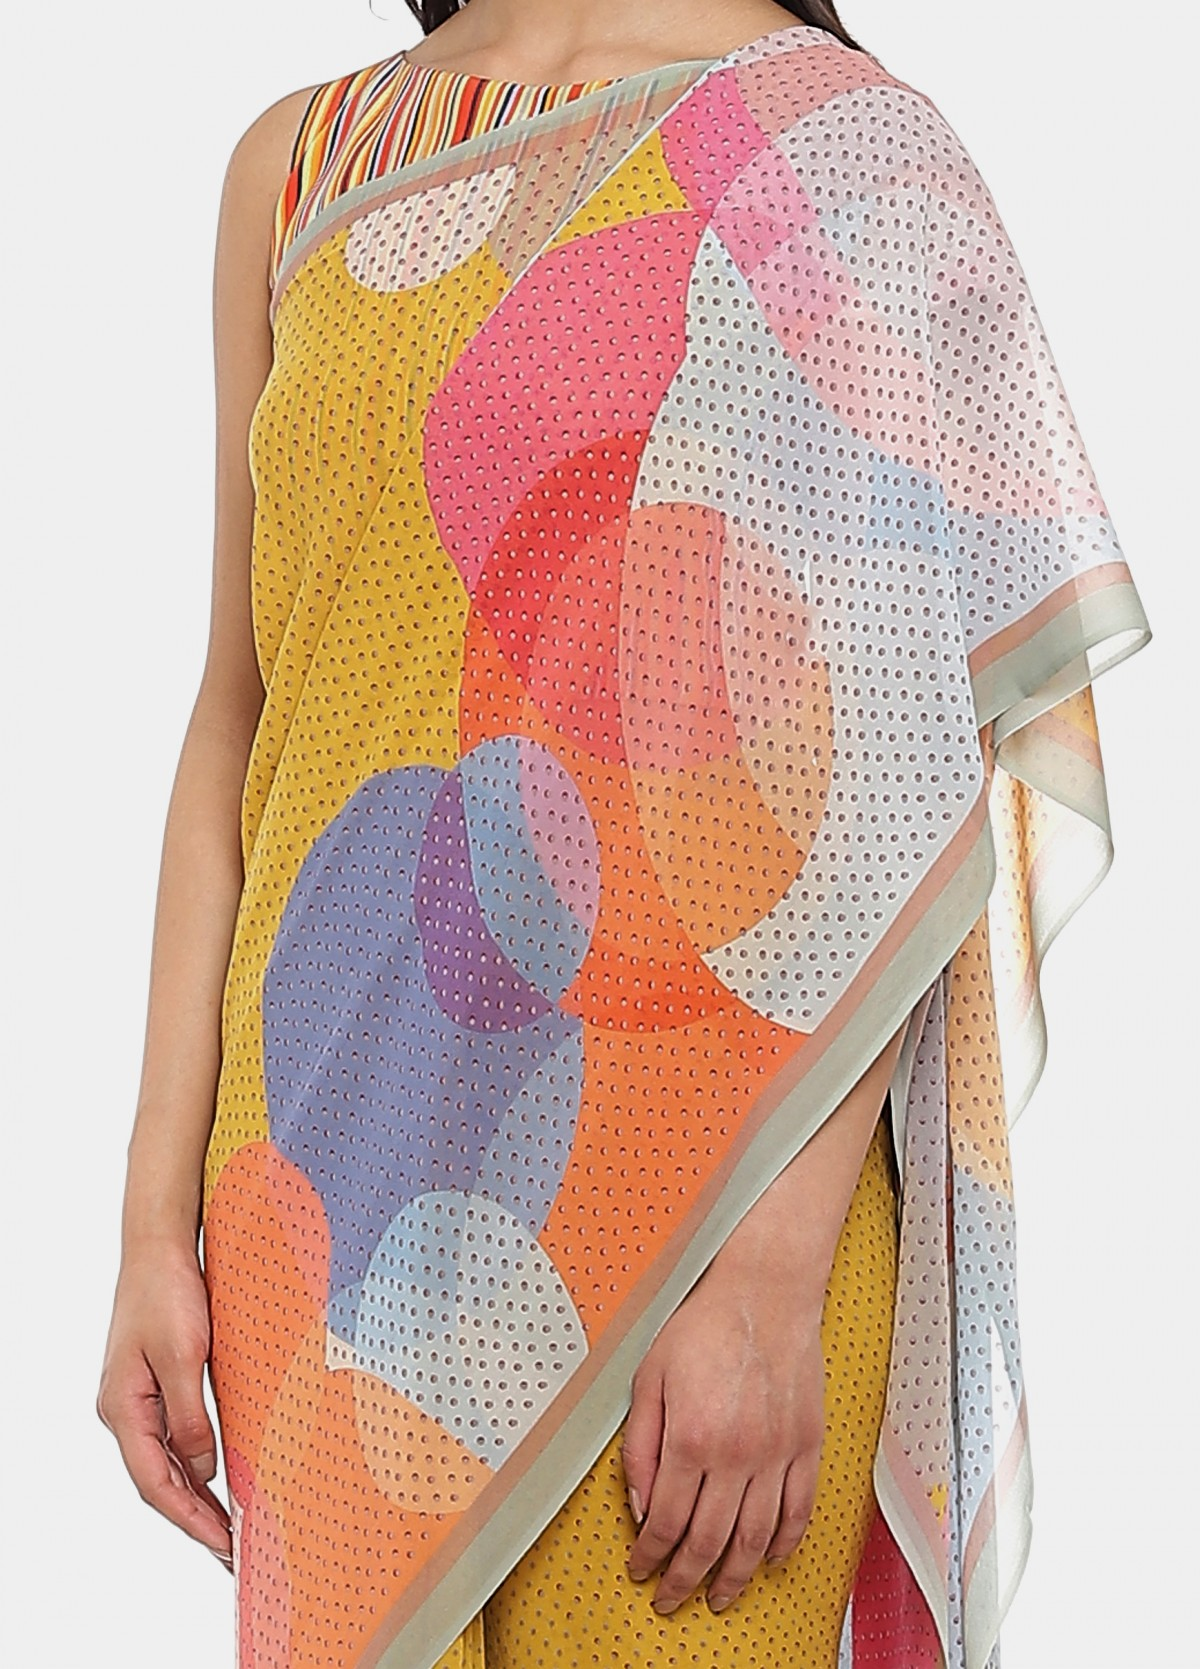 The Stellar Sari